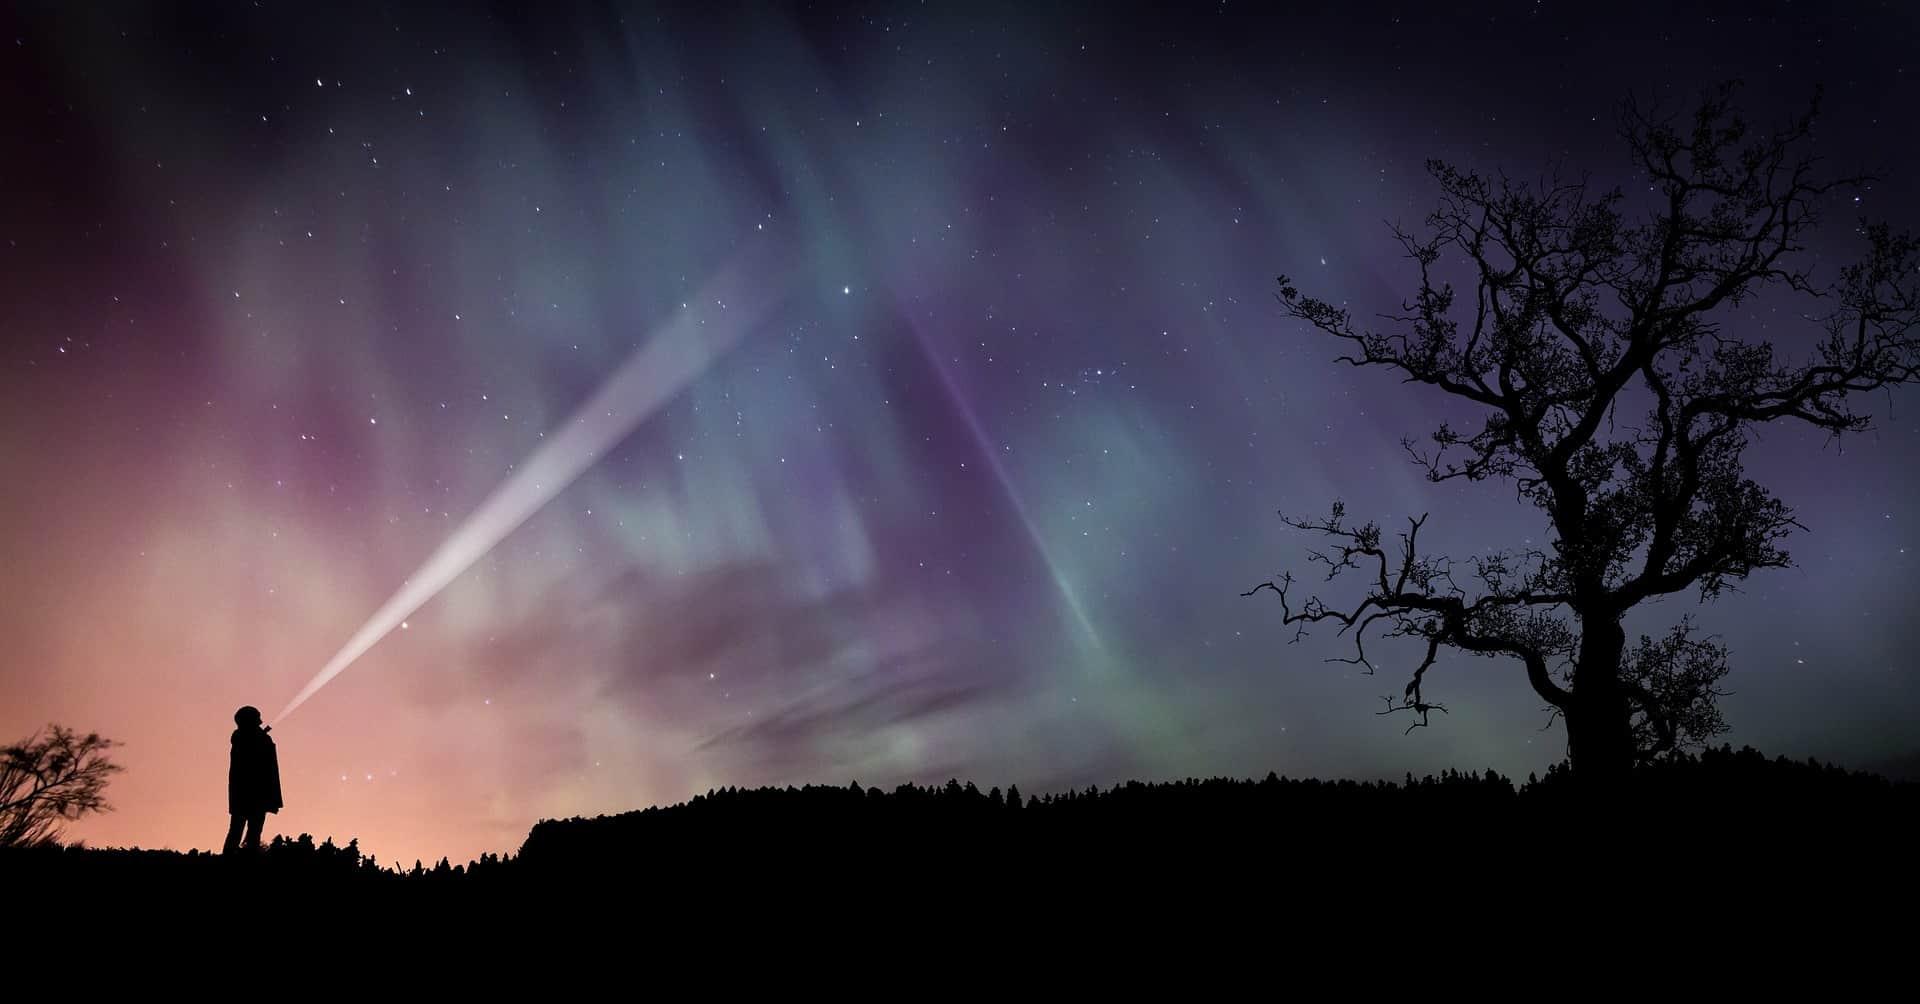 night time star gazing with a lazer pointer